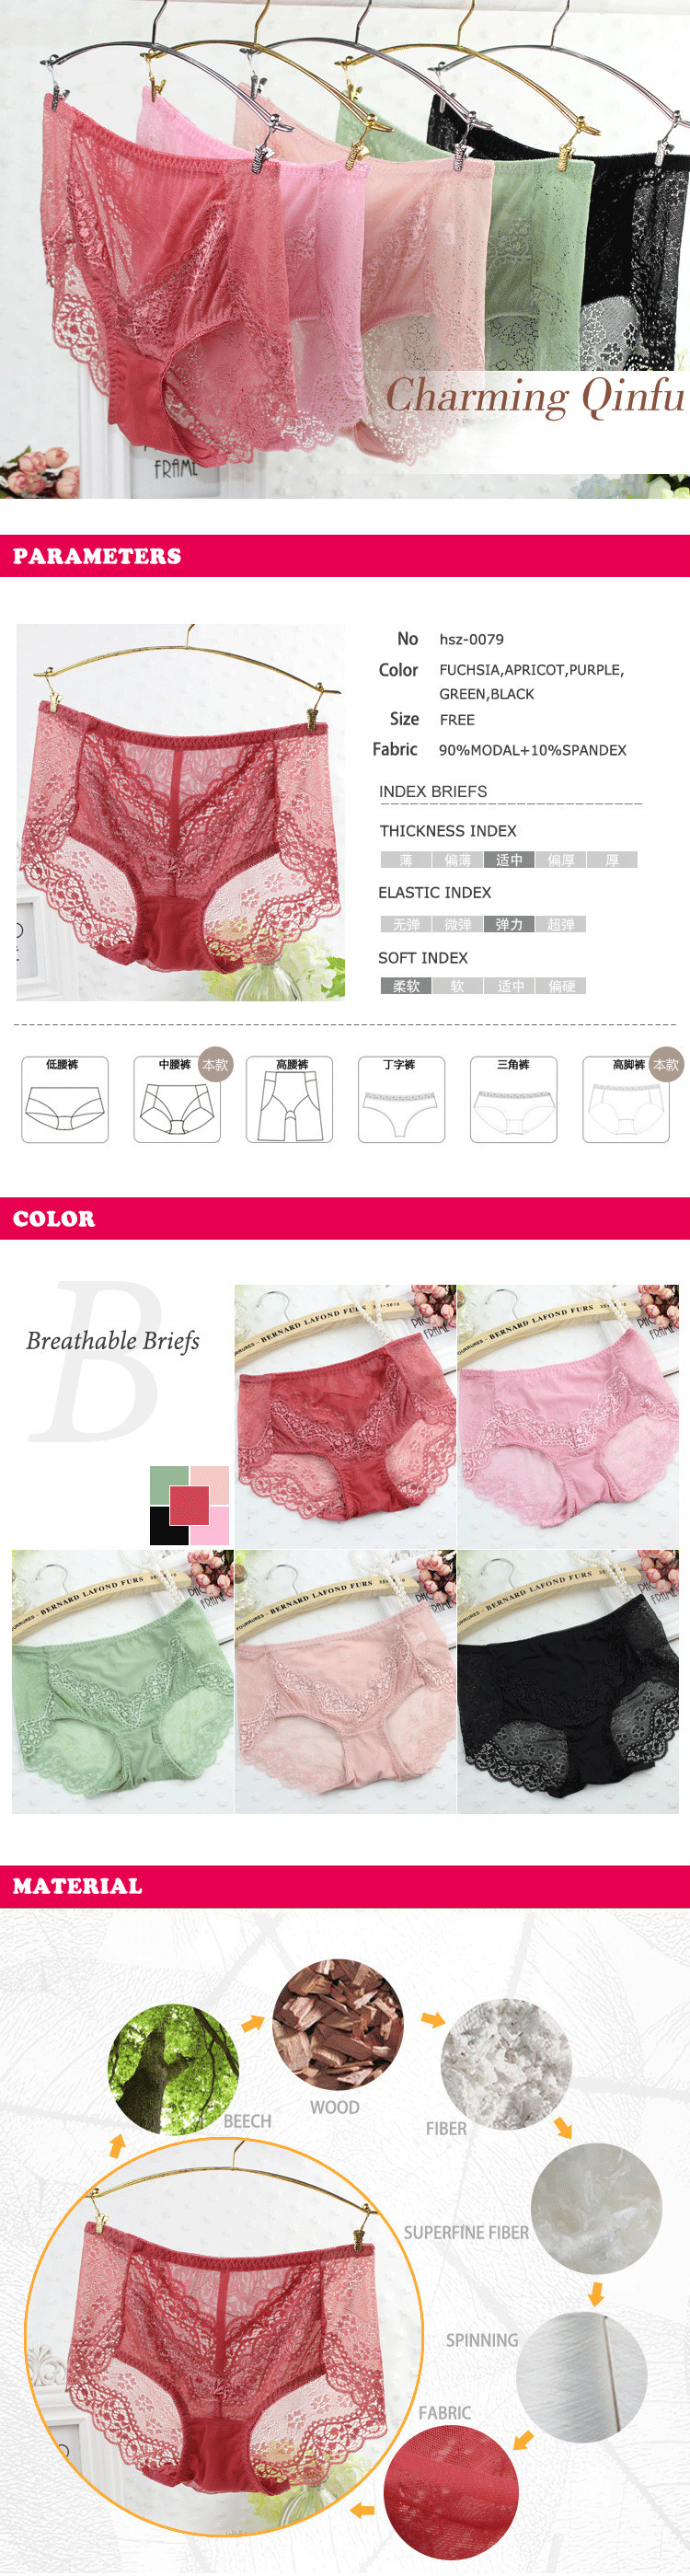 b0dc5b8cfe Factory direct sale cheap cute transparent womens sexy underwear sexy mini  lace panty sexy mature underwear